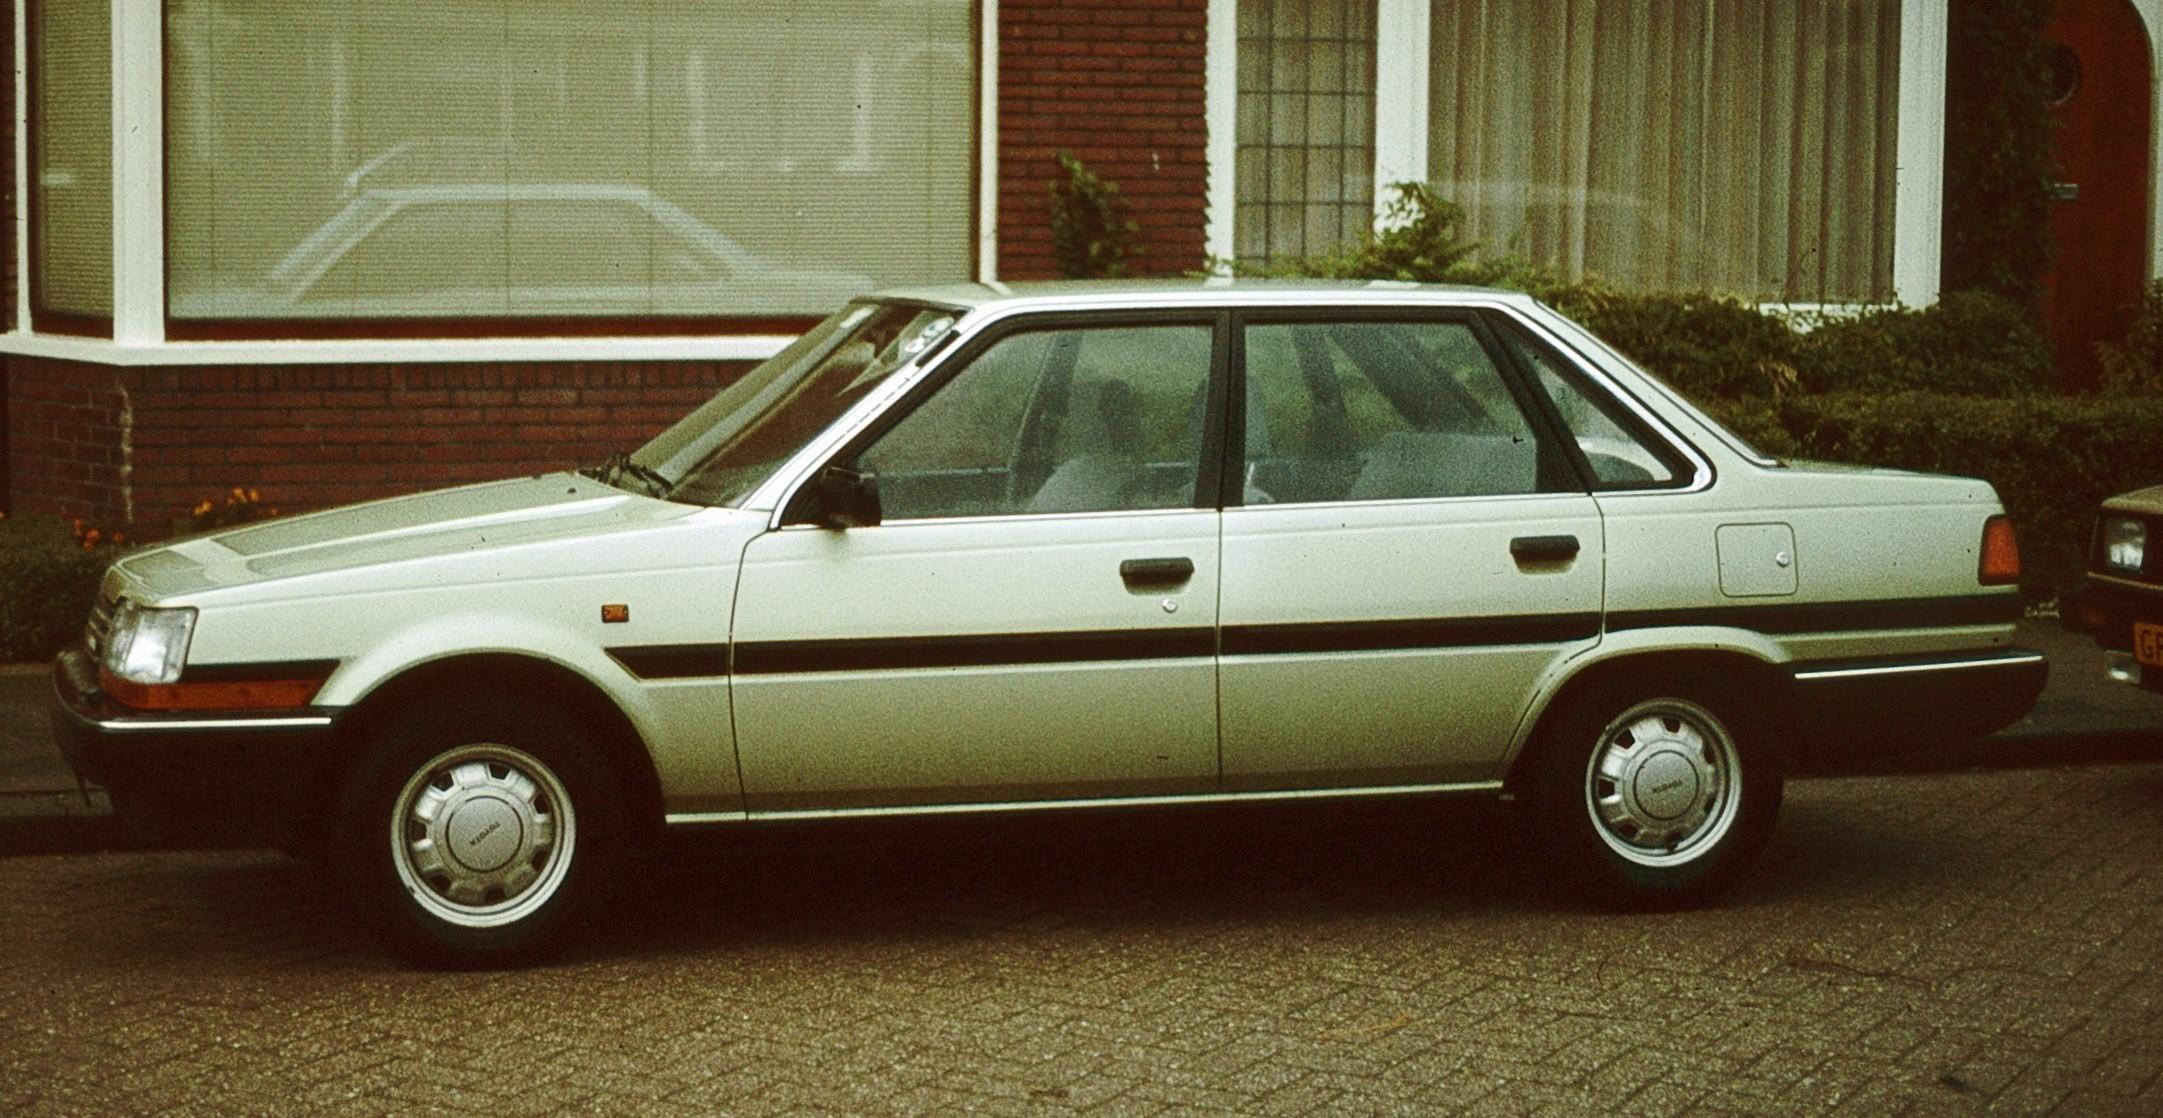 Toyota Carina IV (T150) 1983 - 1988 Sedan #1